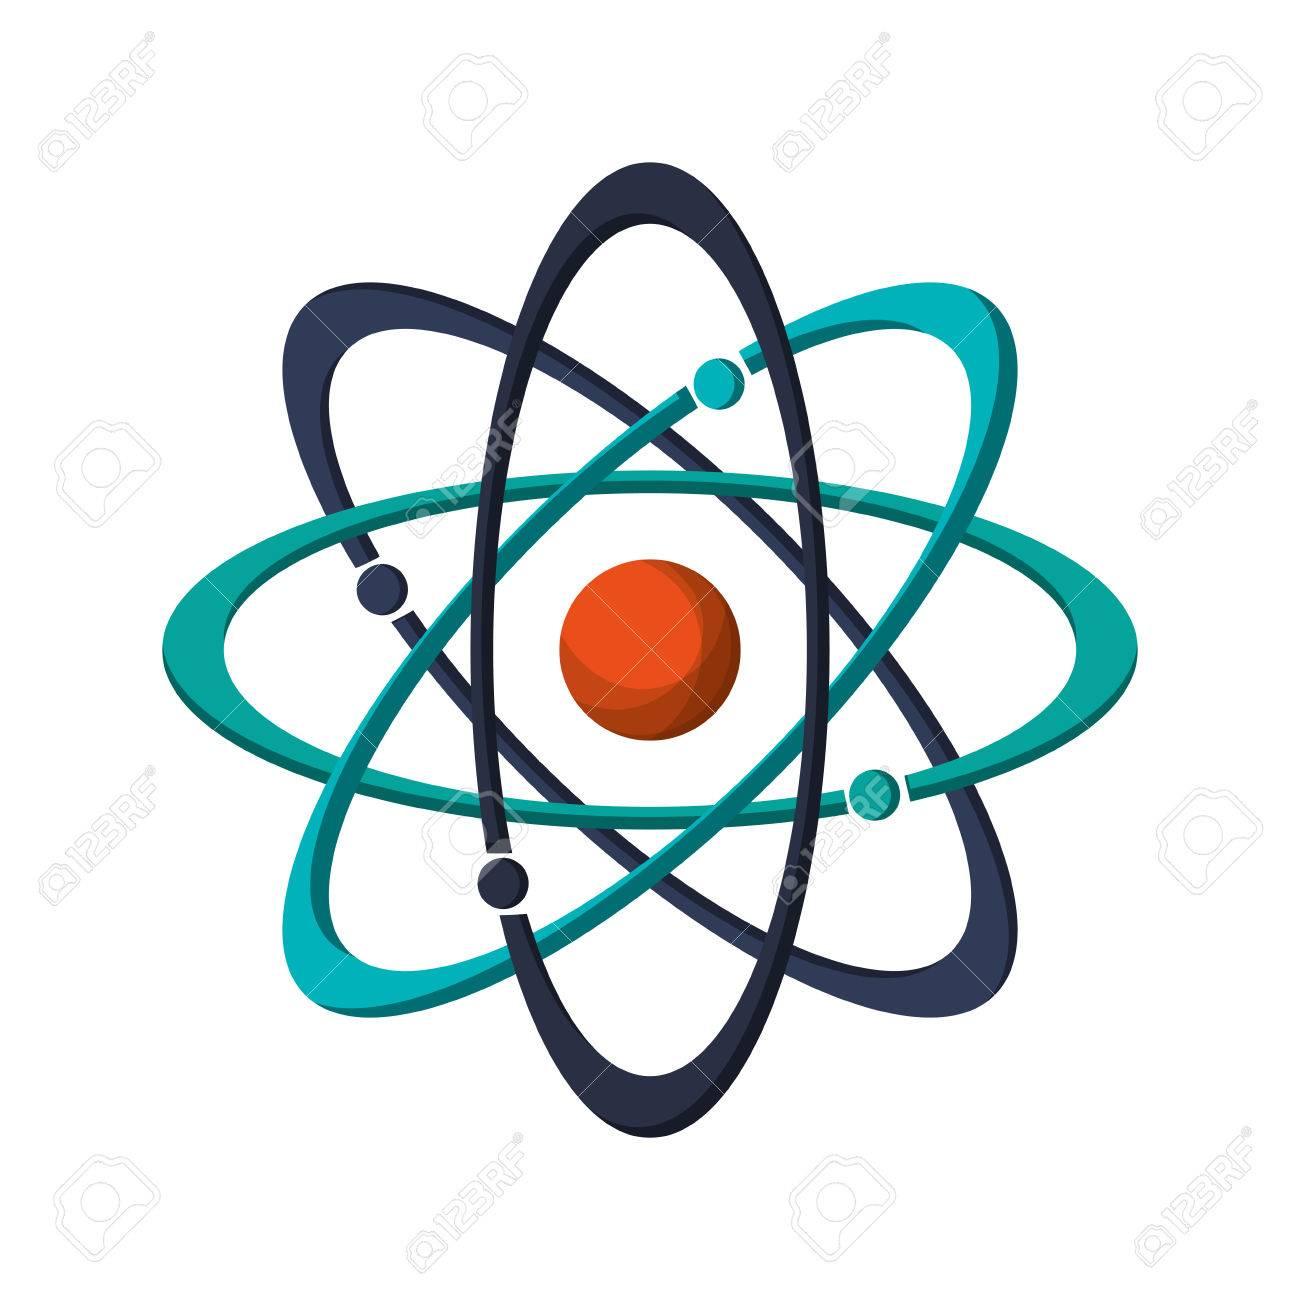 Flat Design Atom Structure Icon Vector Illustration Stock